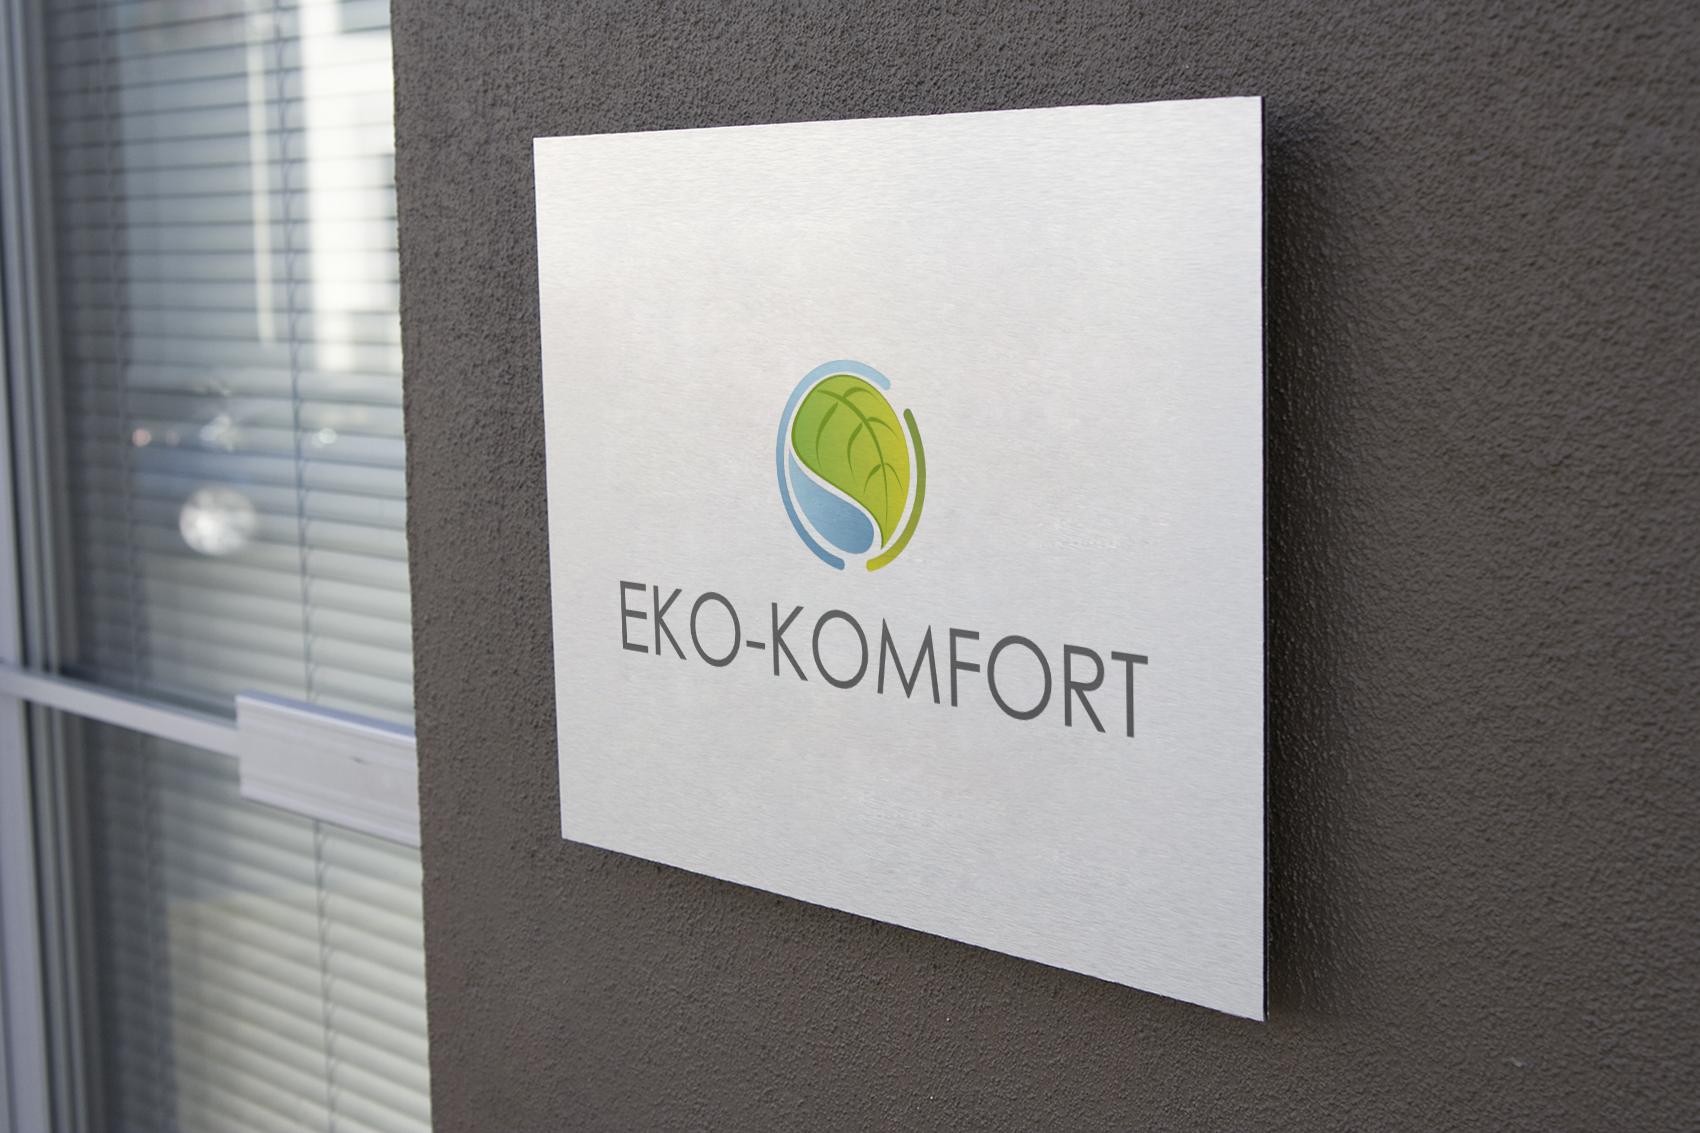 Eko-komfort